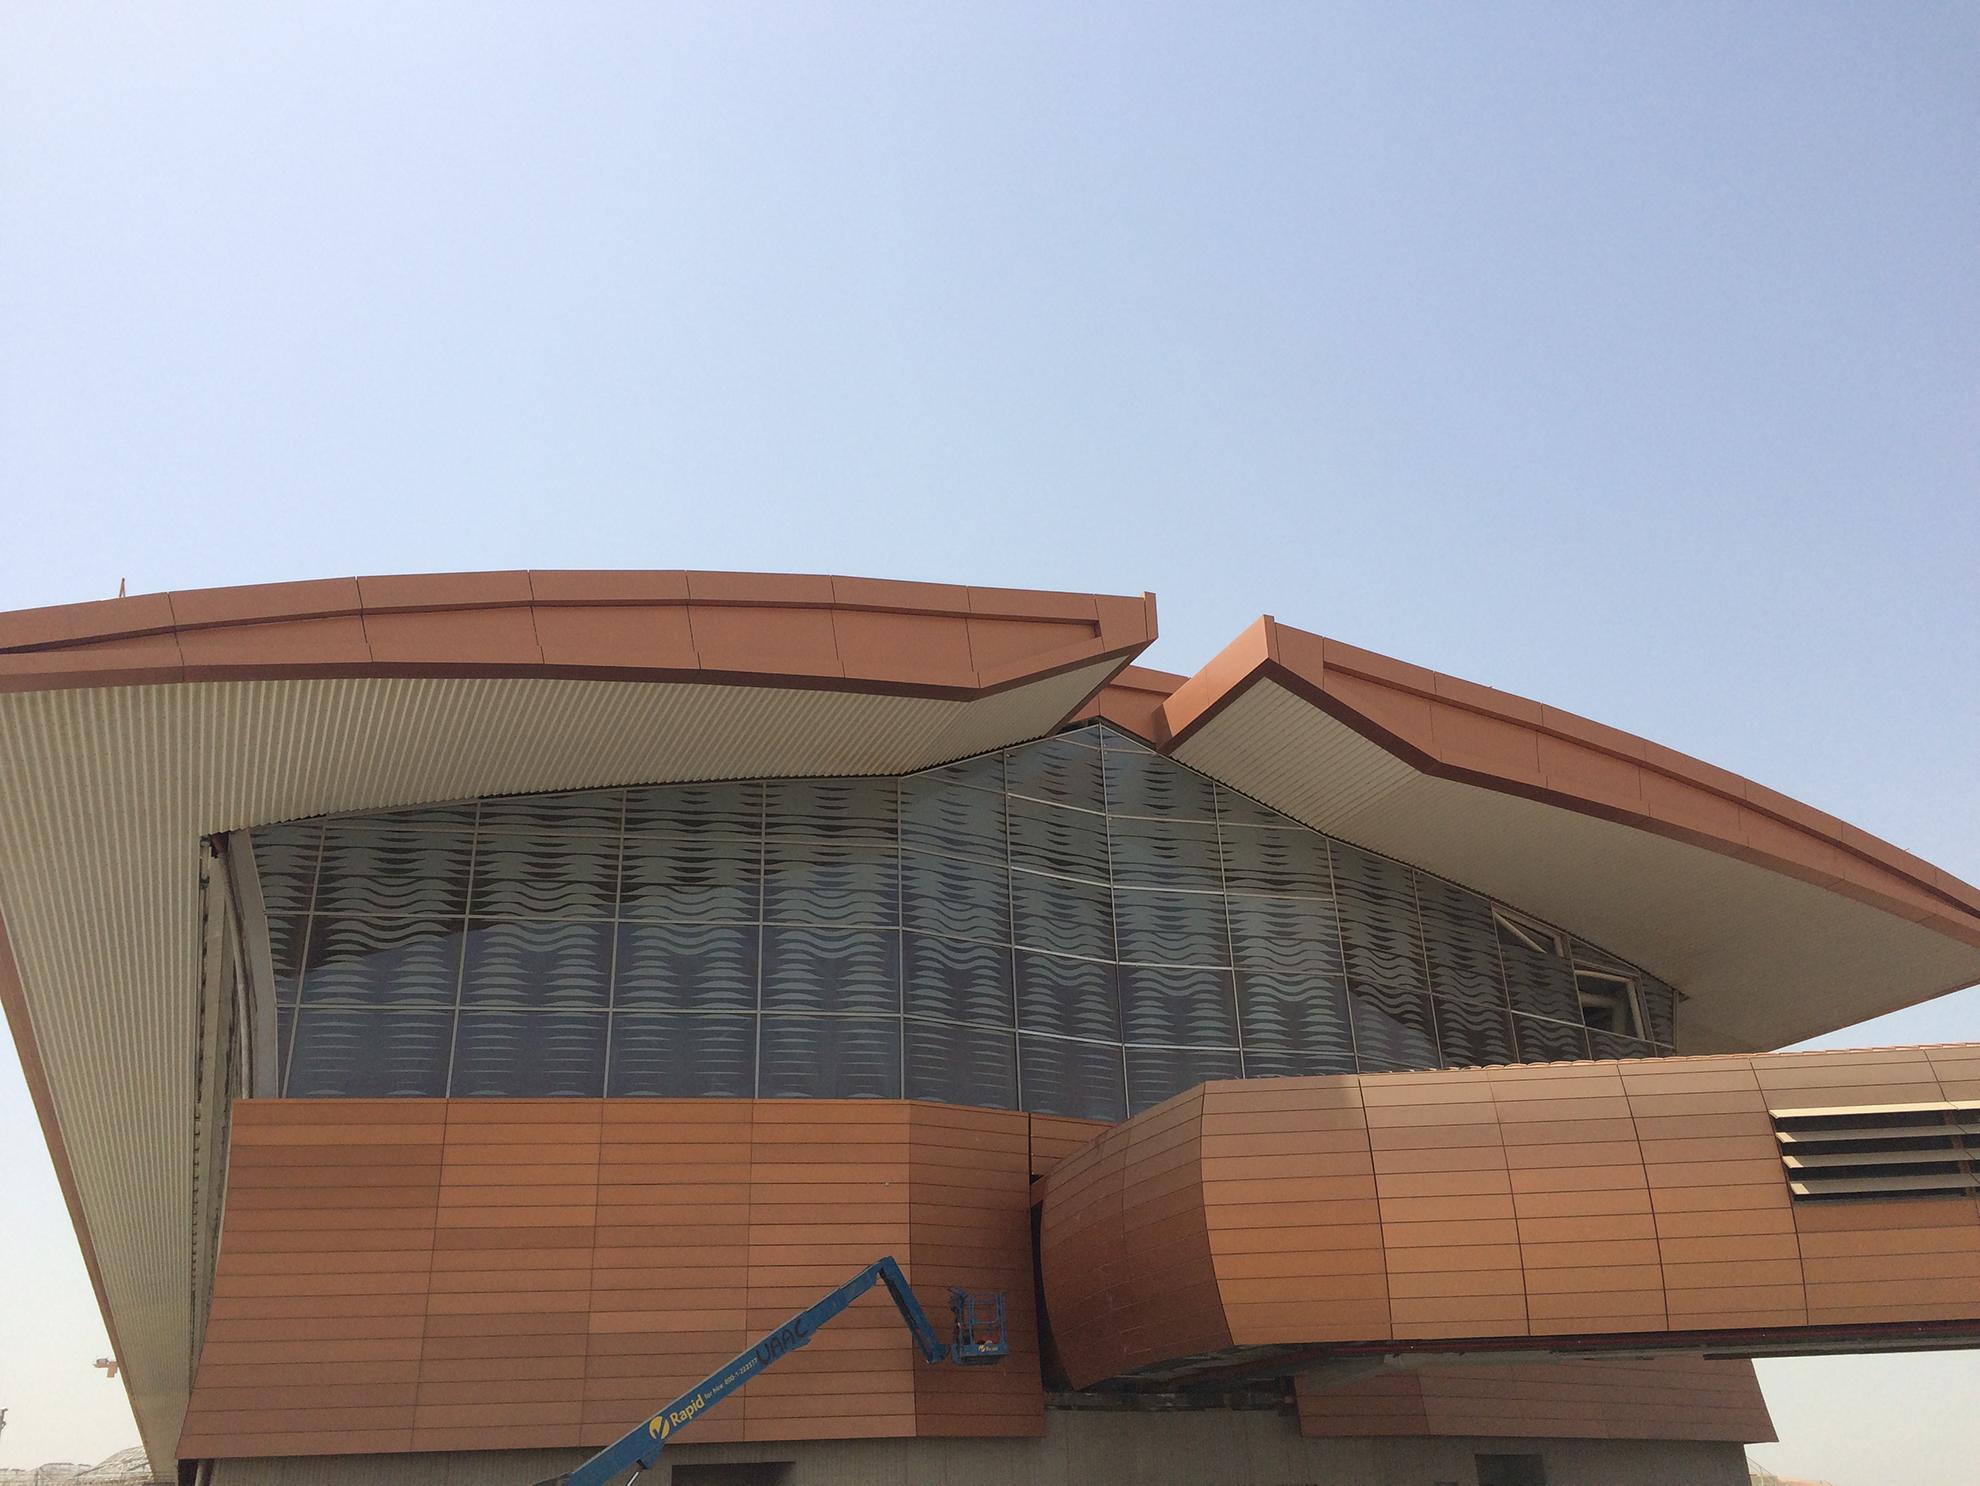 Aeropuerto-KAIA.-Jeddah-Arabia-Saudi.-larson-12_1585819962.jpg